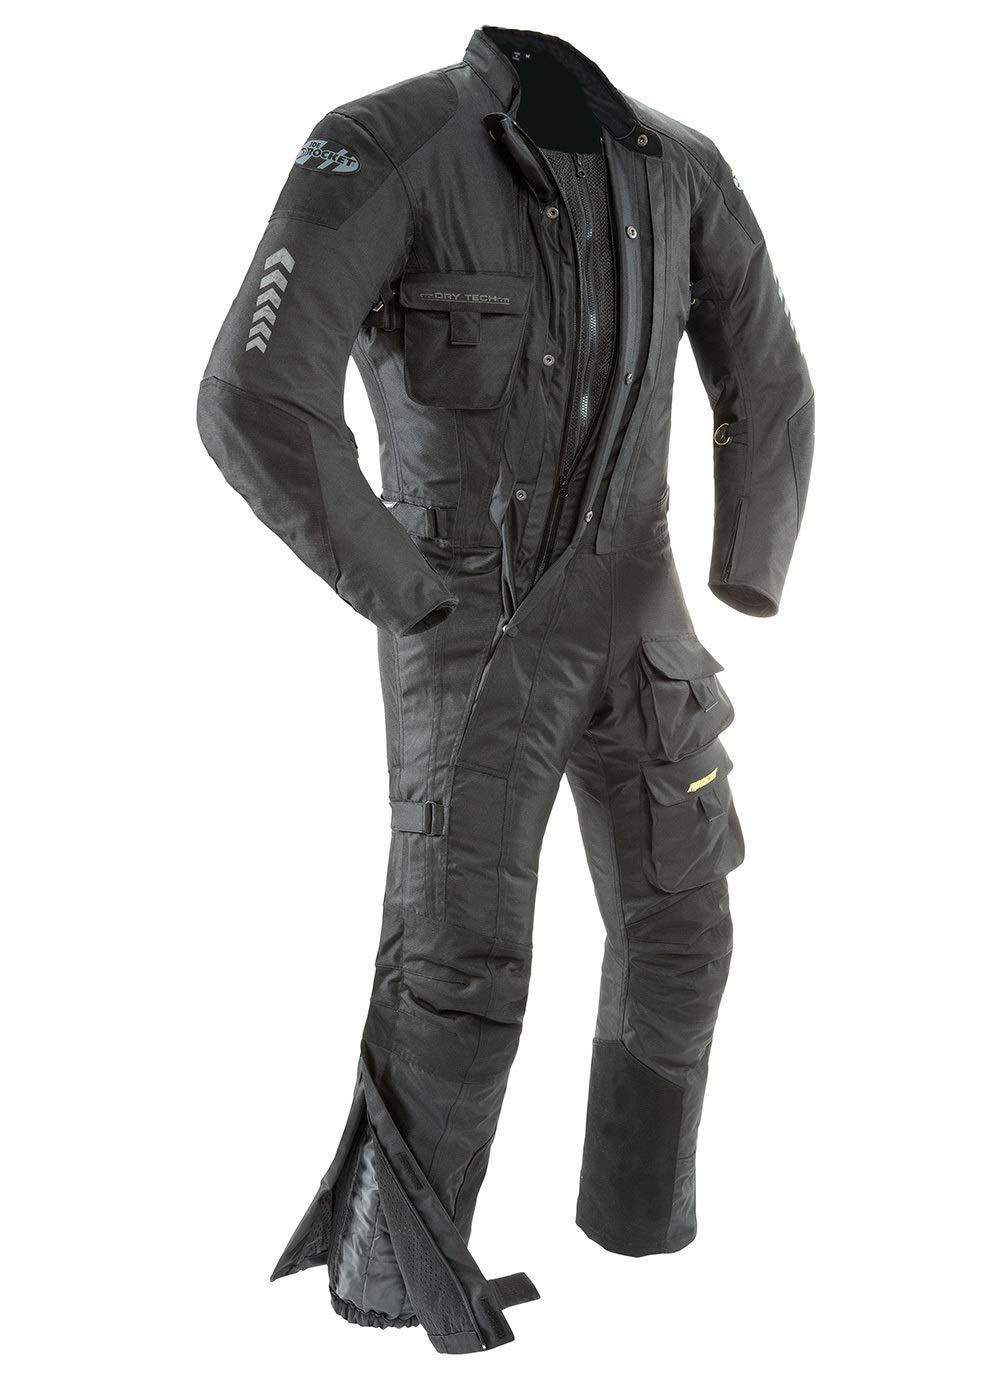 Joe Rocket Survivor Mens Waterproof 1-Piece Motorcycle Riding Suit (Black/Black, Large)